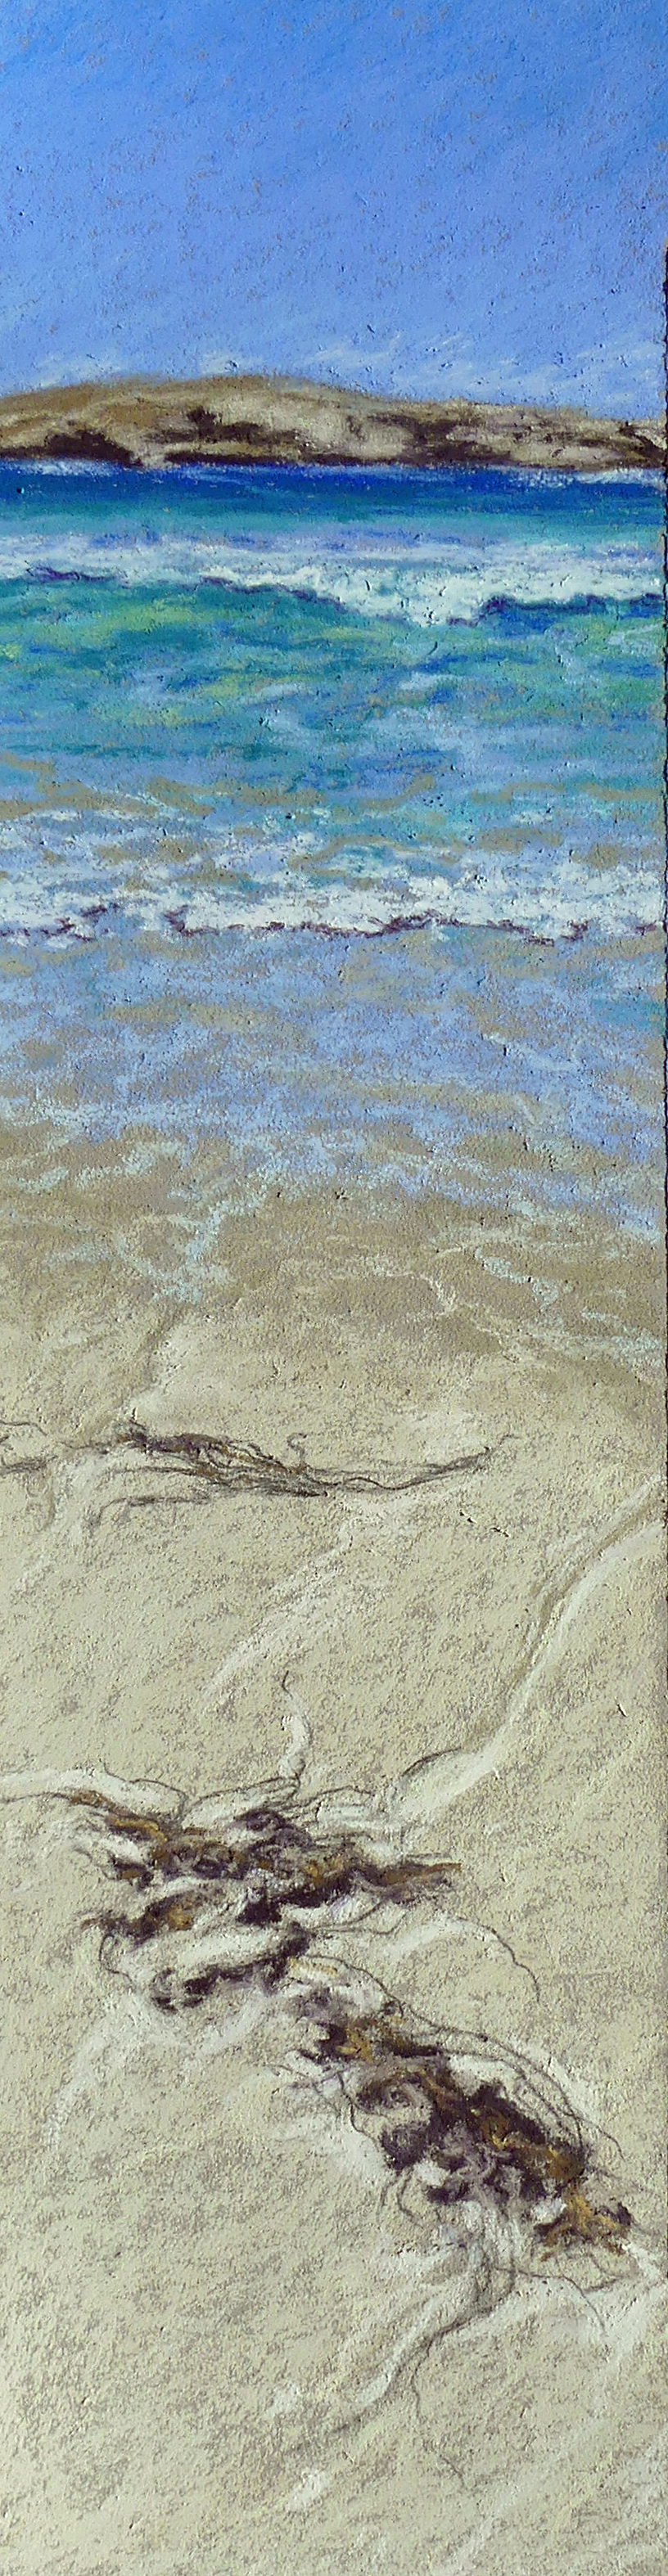 Blue Lagoon I - SOLD